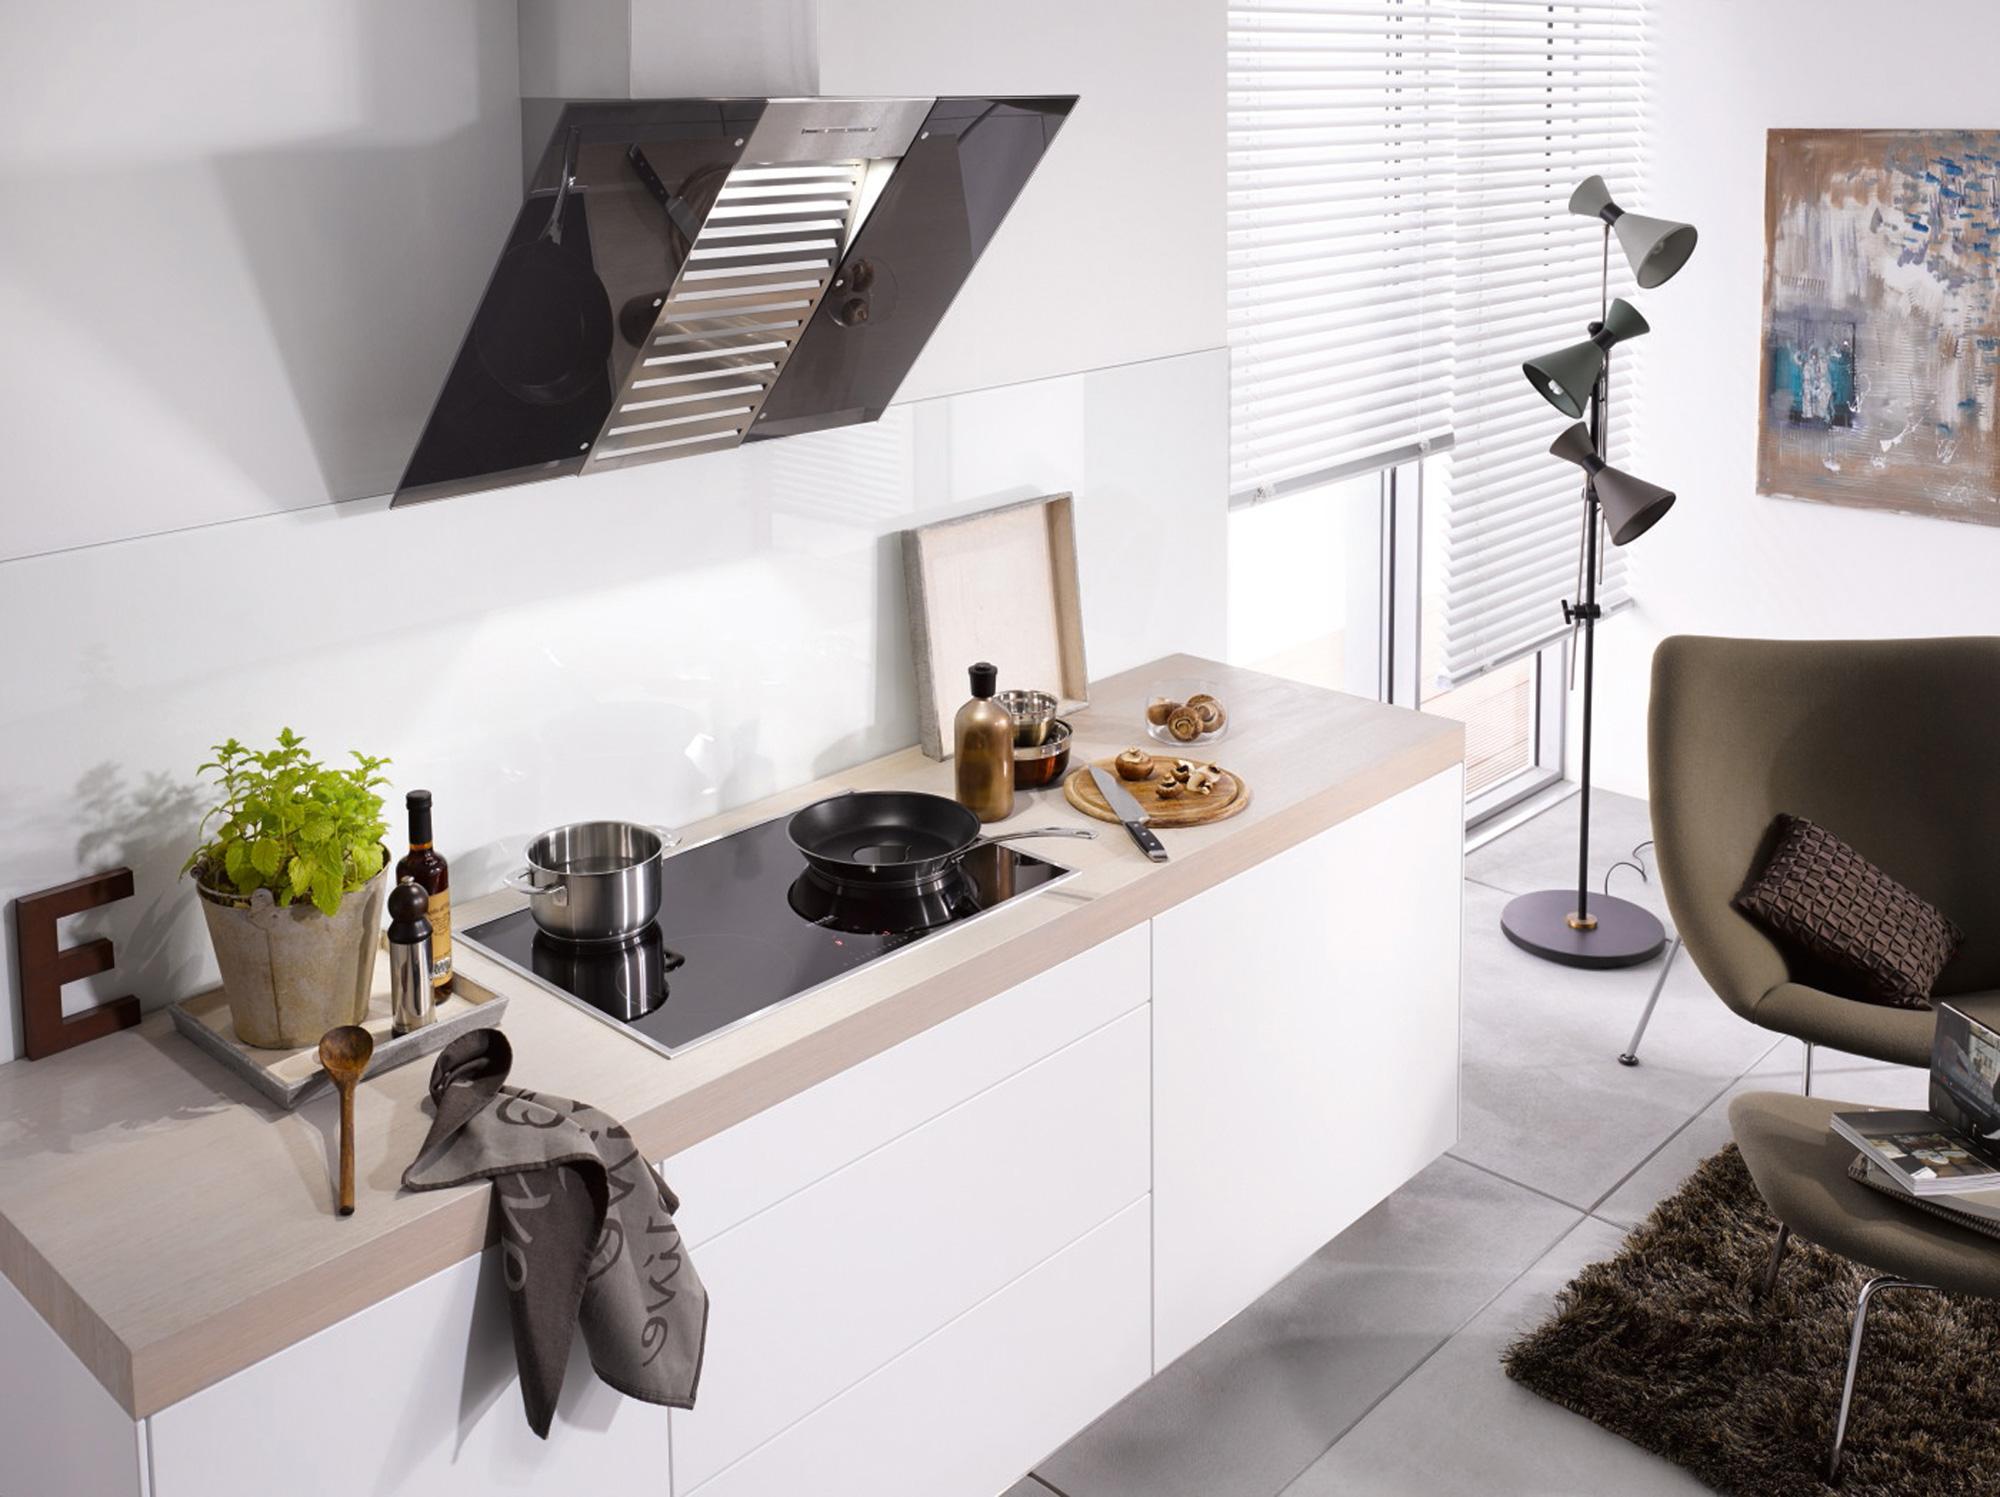 dunstabz ge avancieren zu designobjekten moderne k che magazin. Black Bedroom Furniture Sets. Home Design Ideas